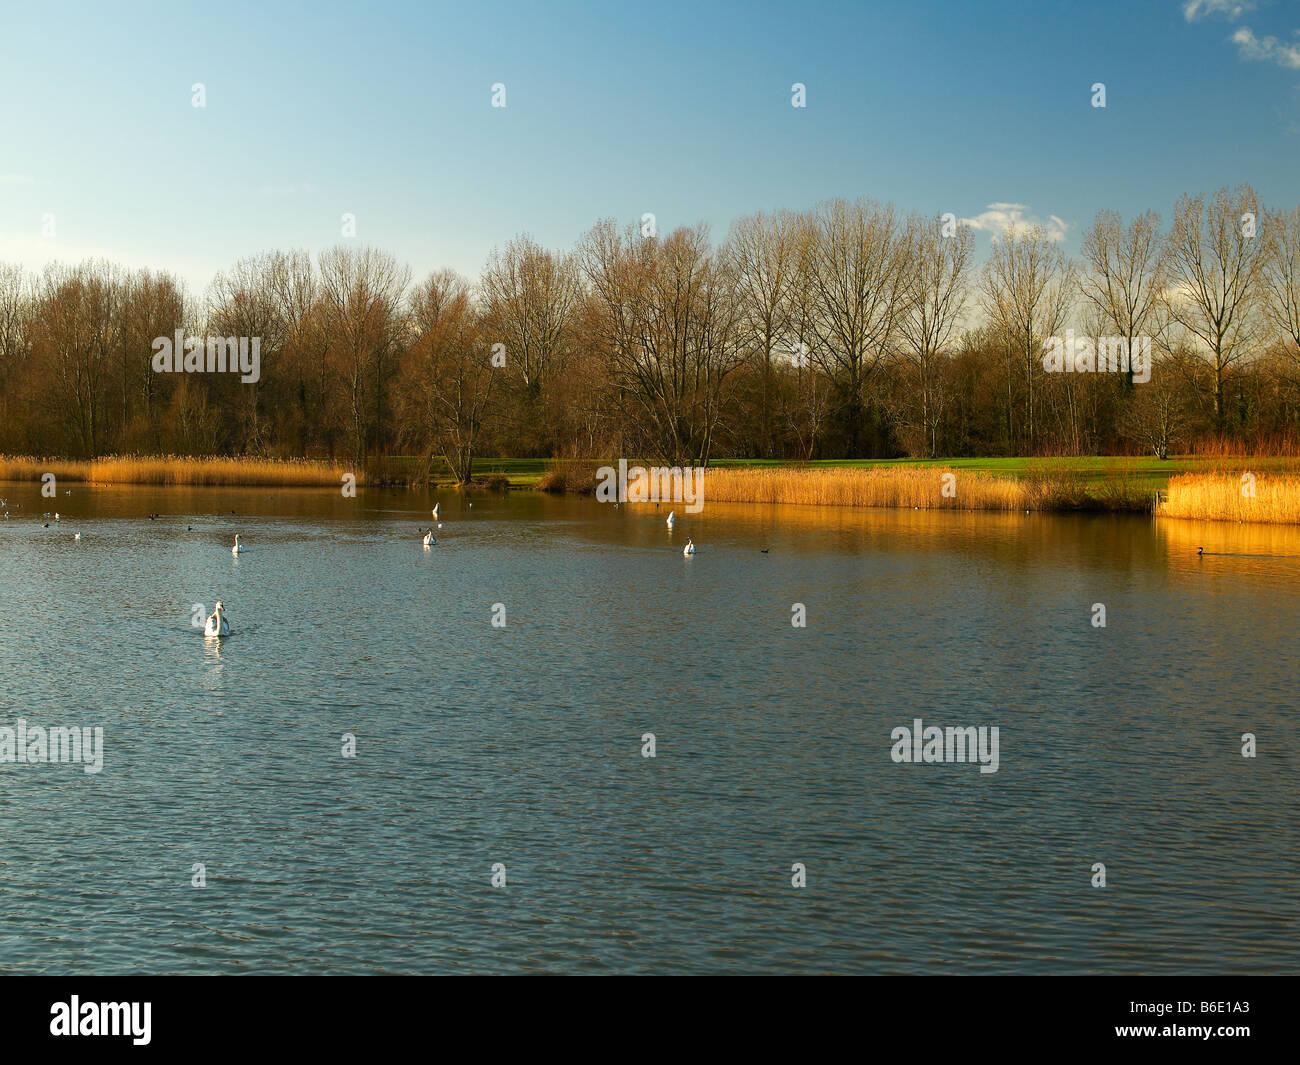 Willen Lake, Milton Keynes, Midland, UK - Stock Image